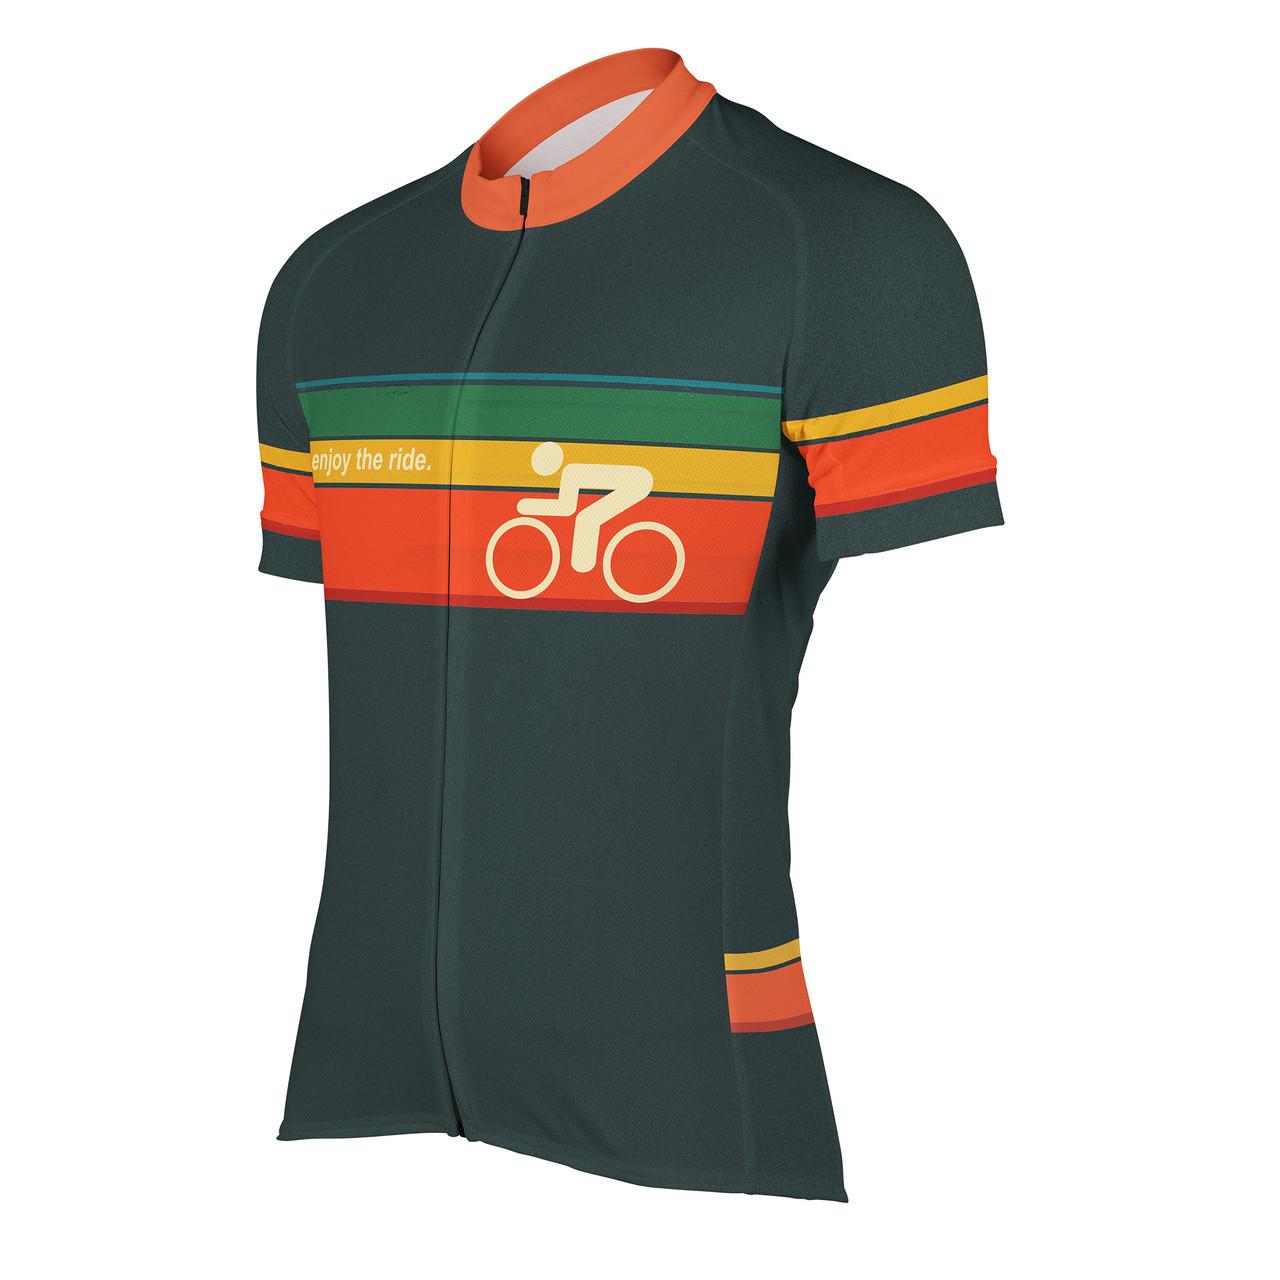 Men s Cycling Jersey Enjoy the Ride Peak 1 Sports 05defccaa